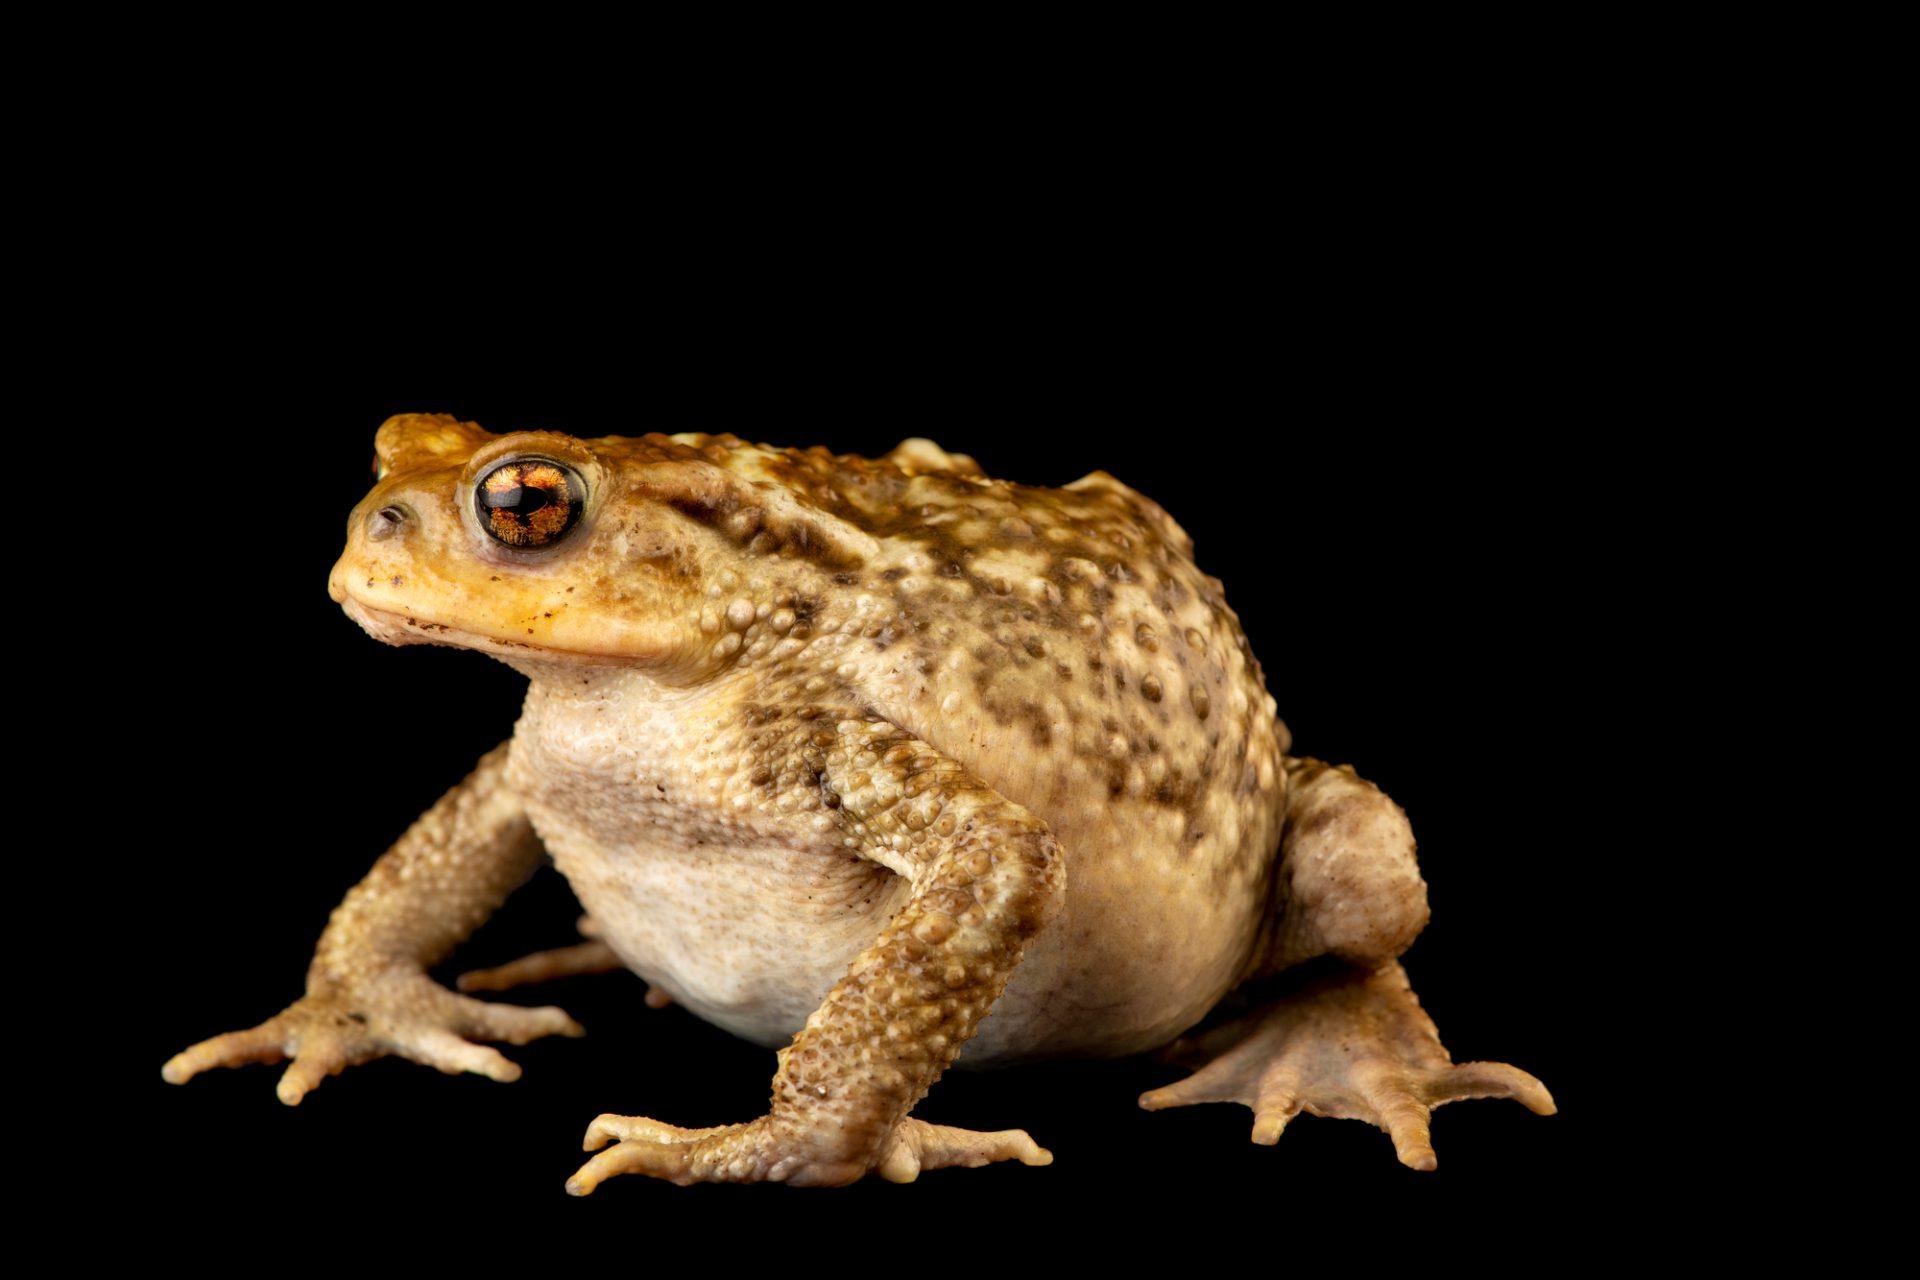 Photo: Spiny toad (Bufo spinosus) at the Environmental Education Center of the Ribeiras de Gaia.